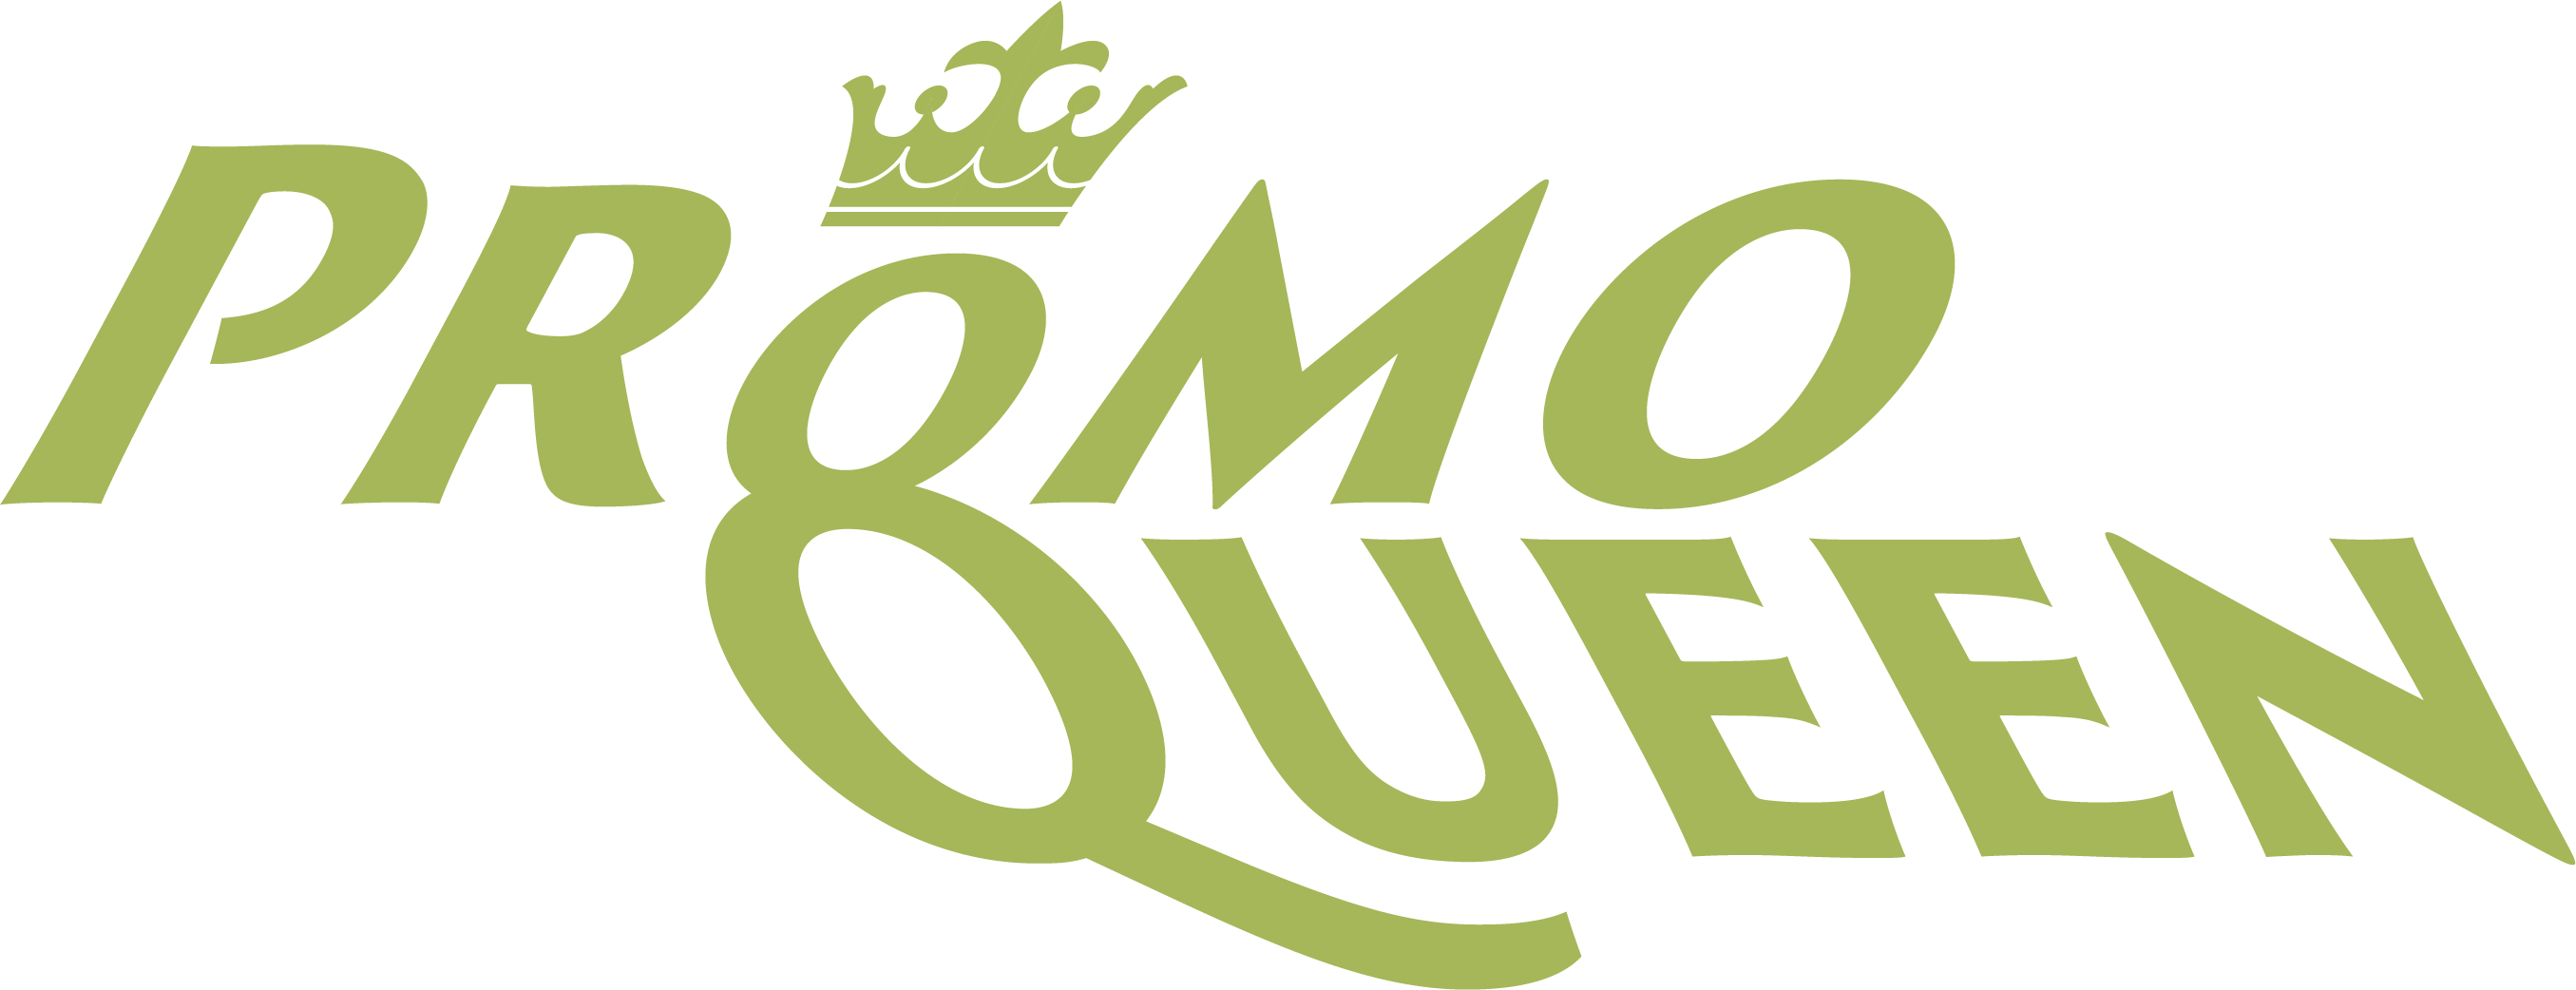 Introductie Promo Queen